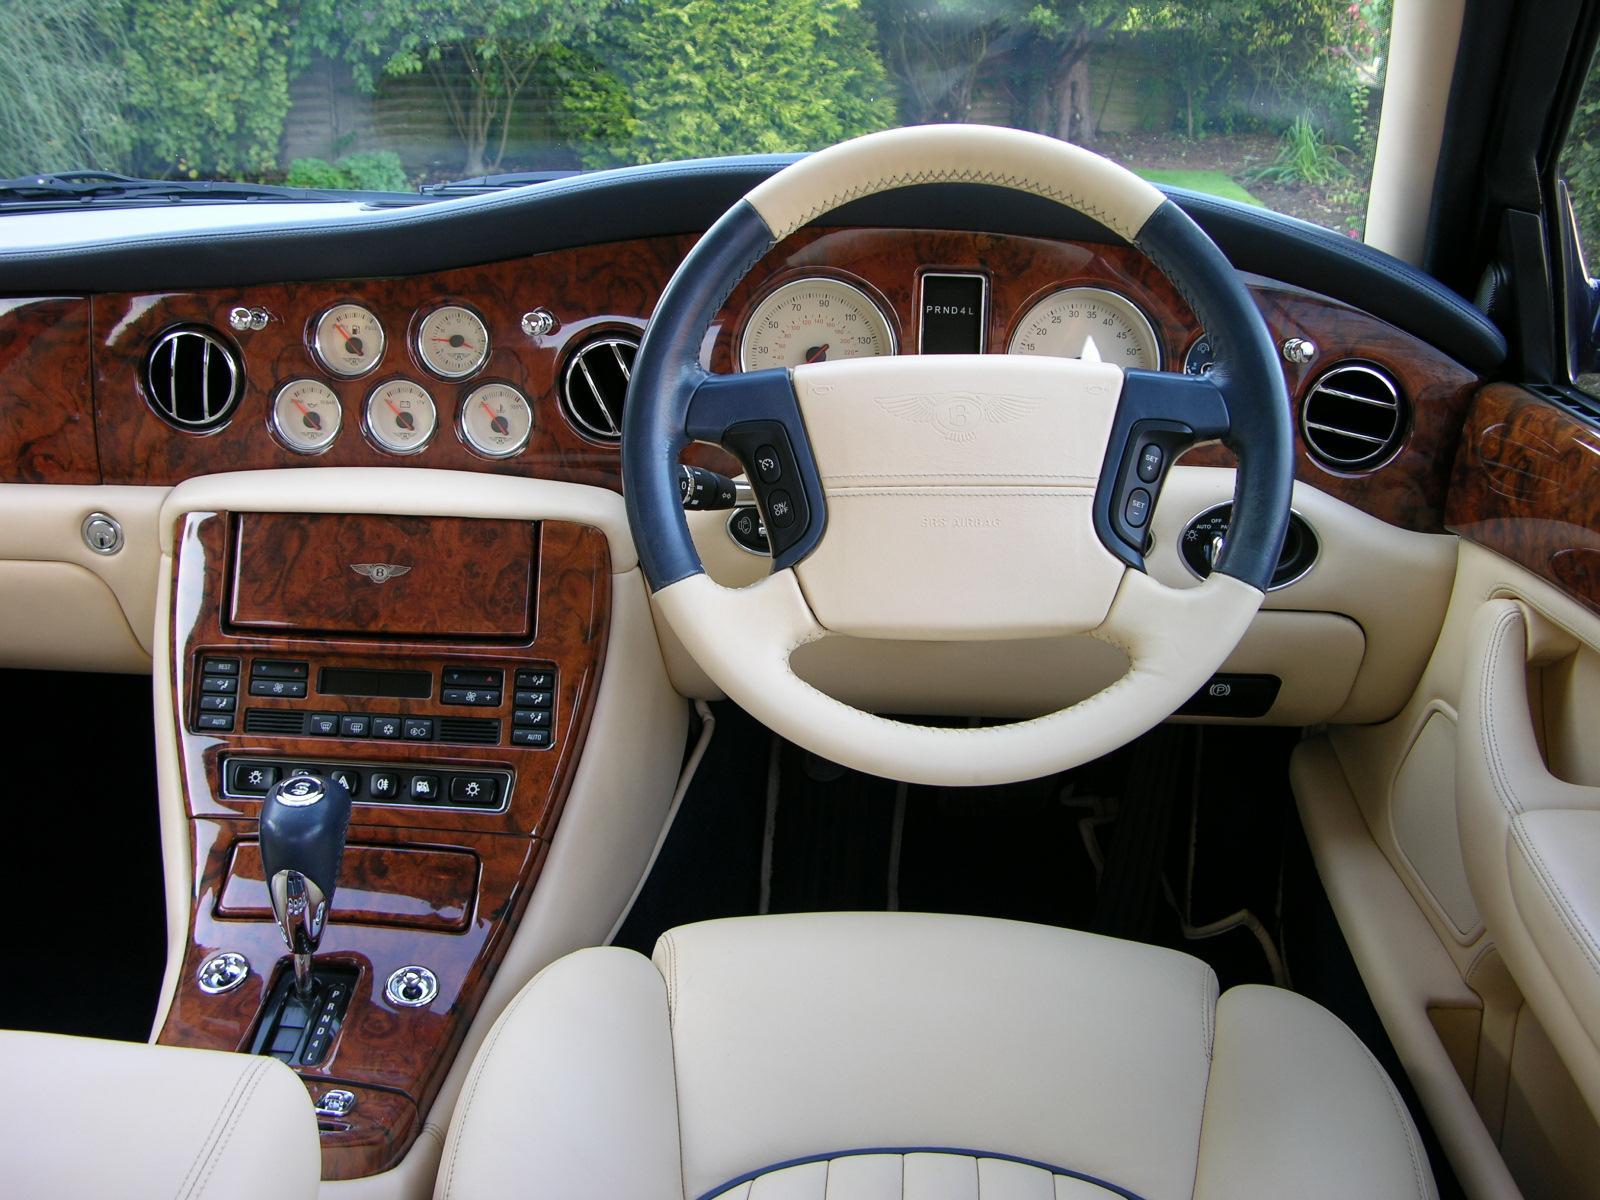 Permalink to Bentley Car Interior Pictures